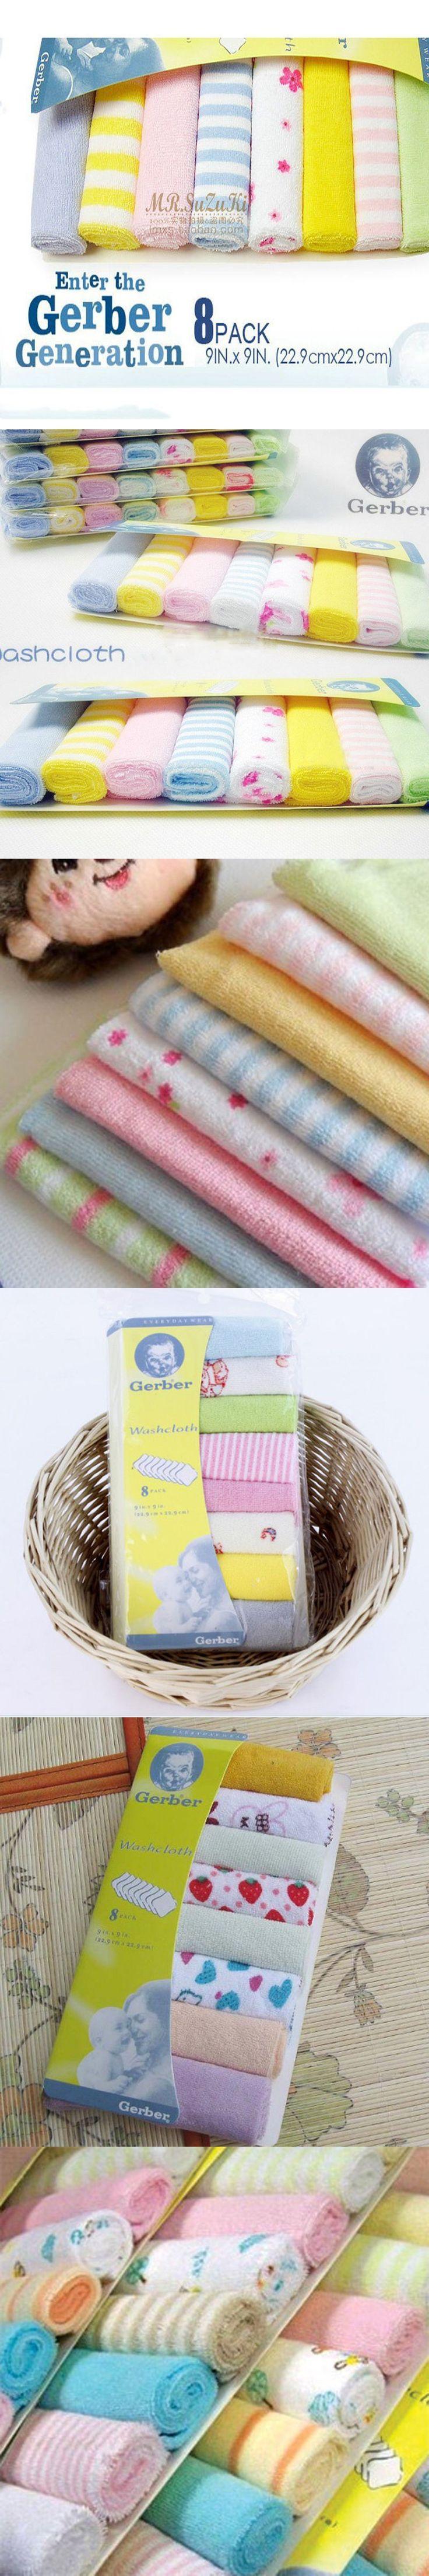 8 Pcs Baby Infant Newborn Kids Bath Towel Washcloth Bathing Feeding Wipe Cloth Soft FT Kit Soft Good Care Colorful Comfortable $2.93